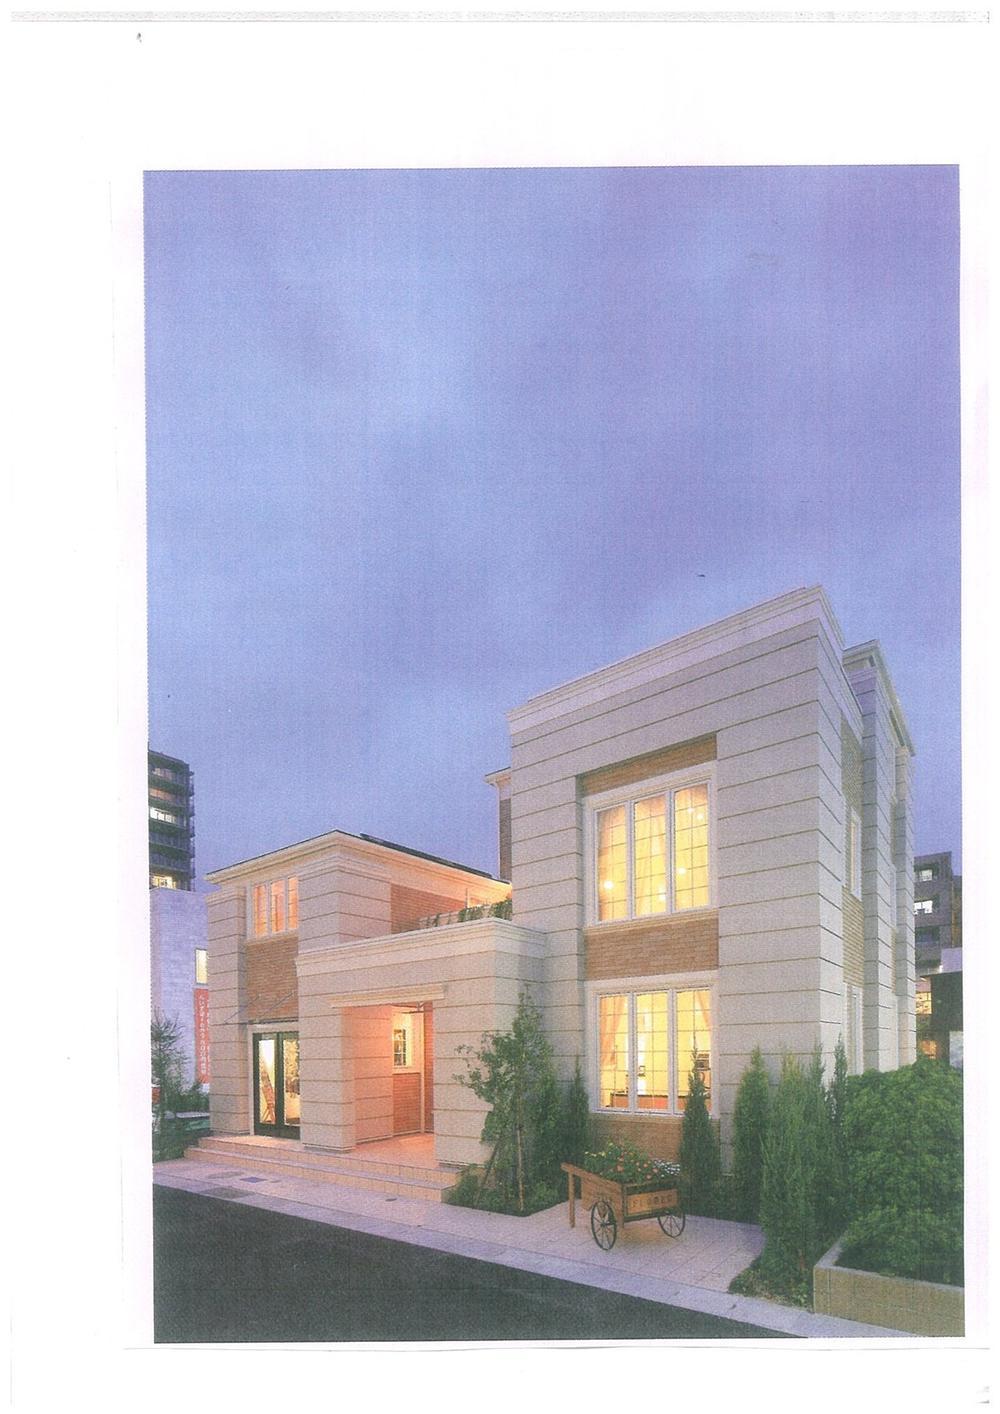 建物プラン例、土地価格1500万円、土地面積370.25m<sup>2</sup>、建物価格2200万円、建物面積132.25m<sup>2</sup> 外観:推奨プラン